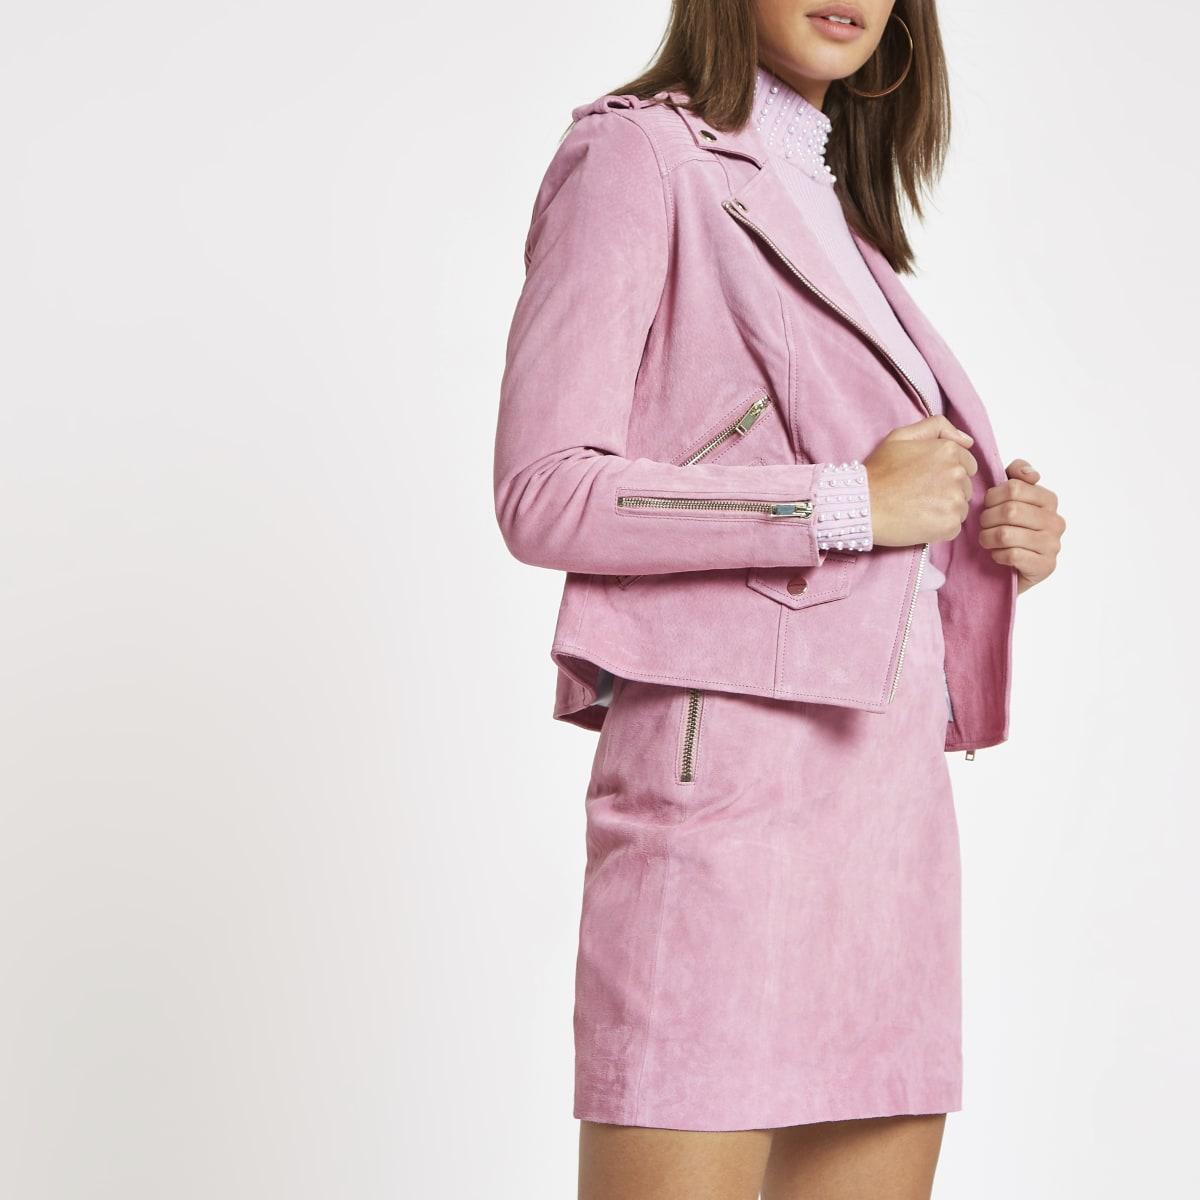 Light pink suede biker jacket